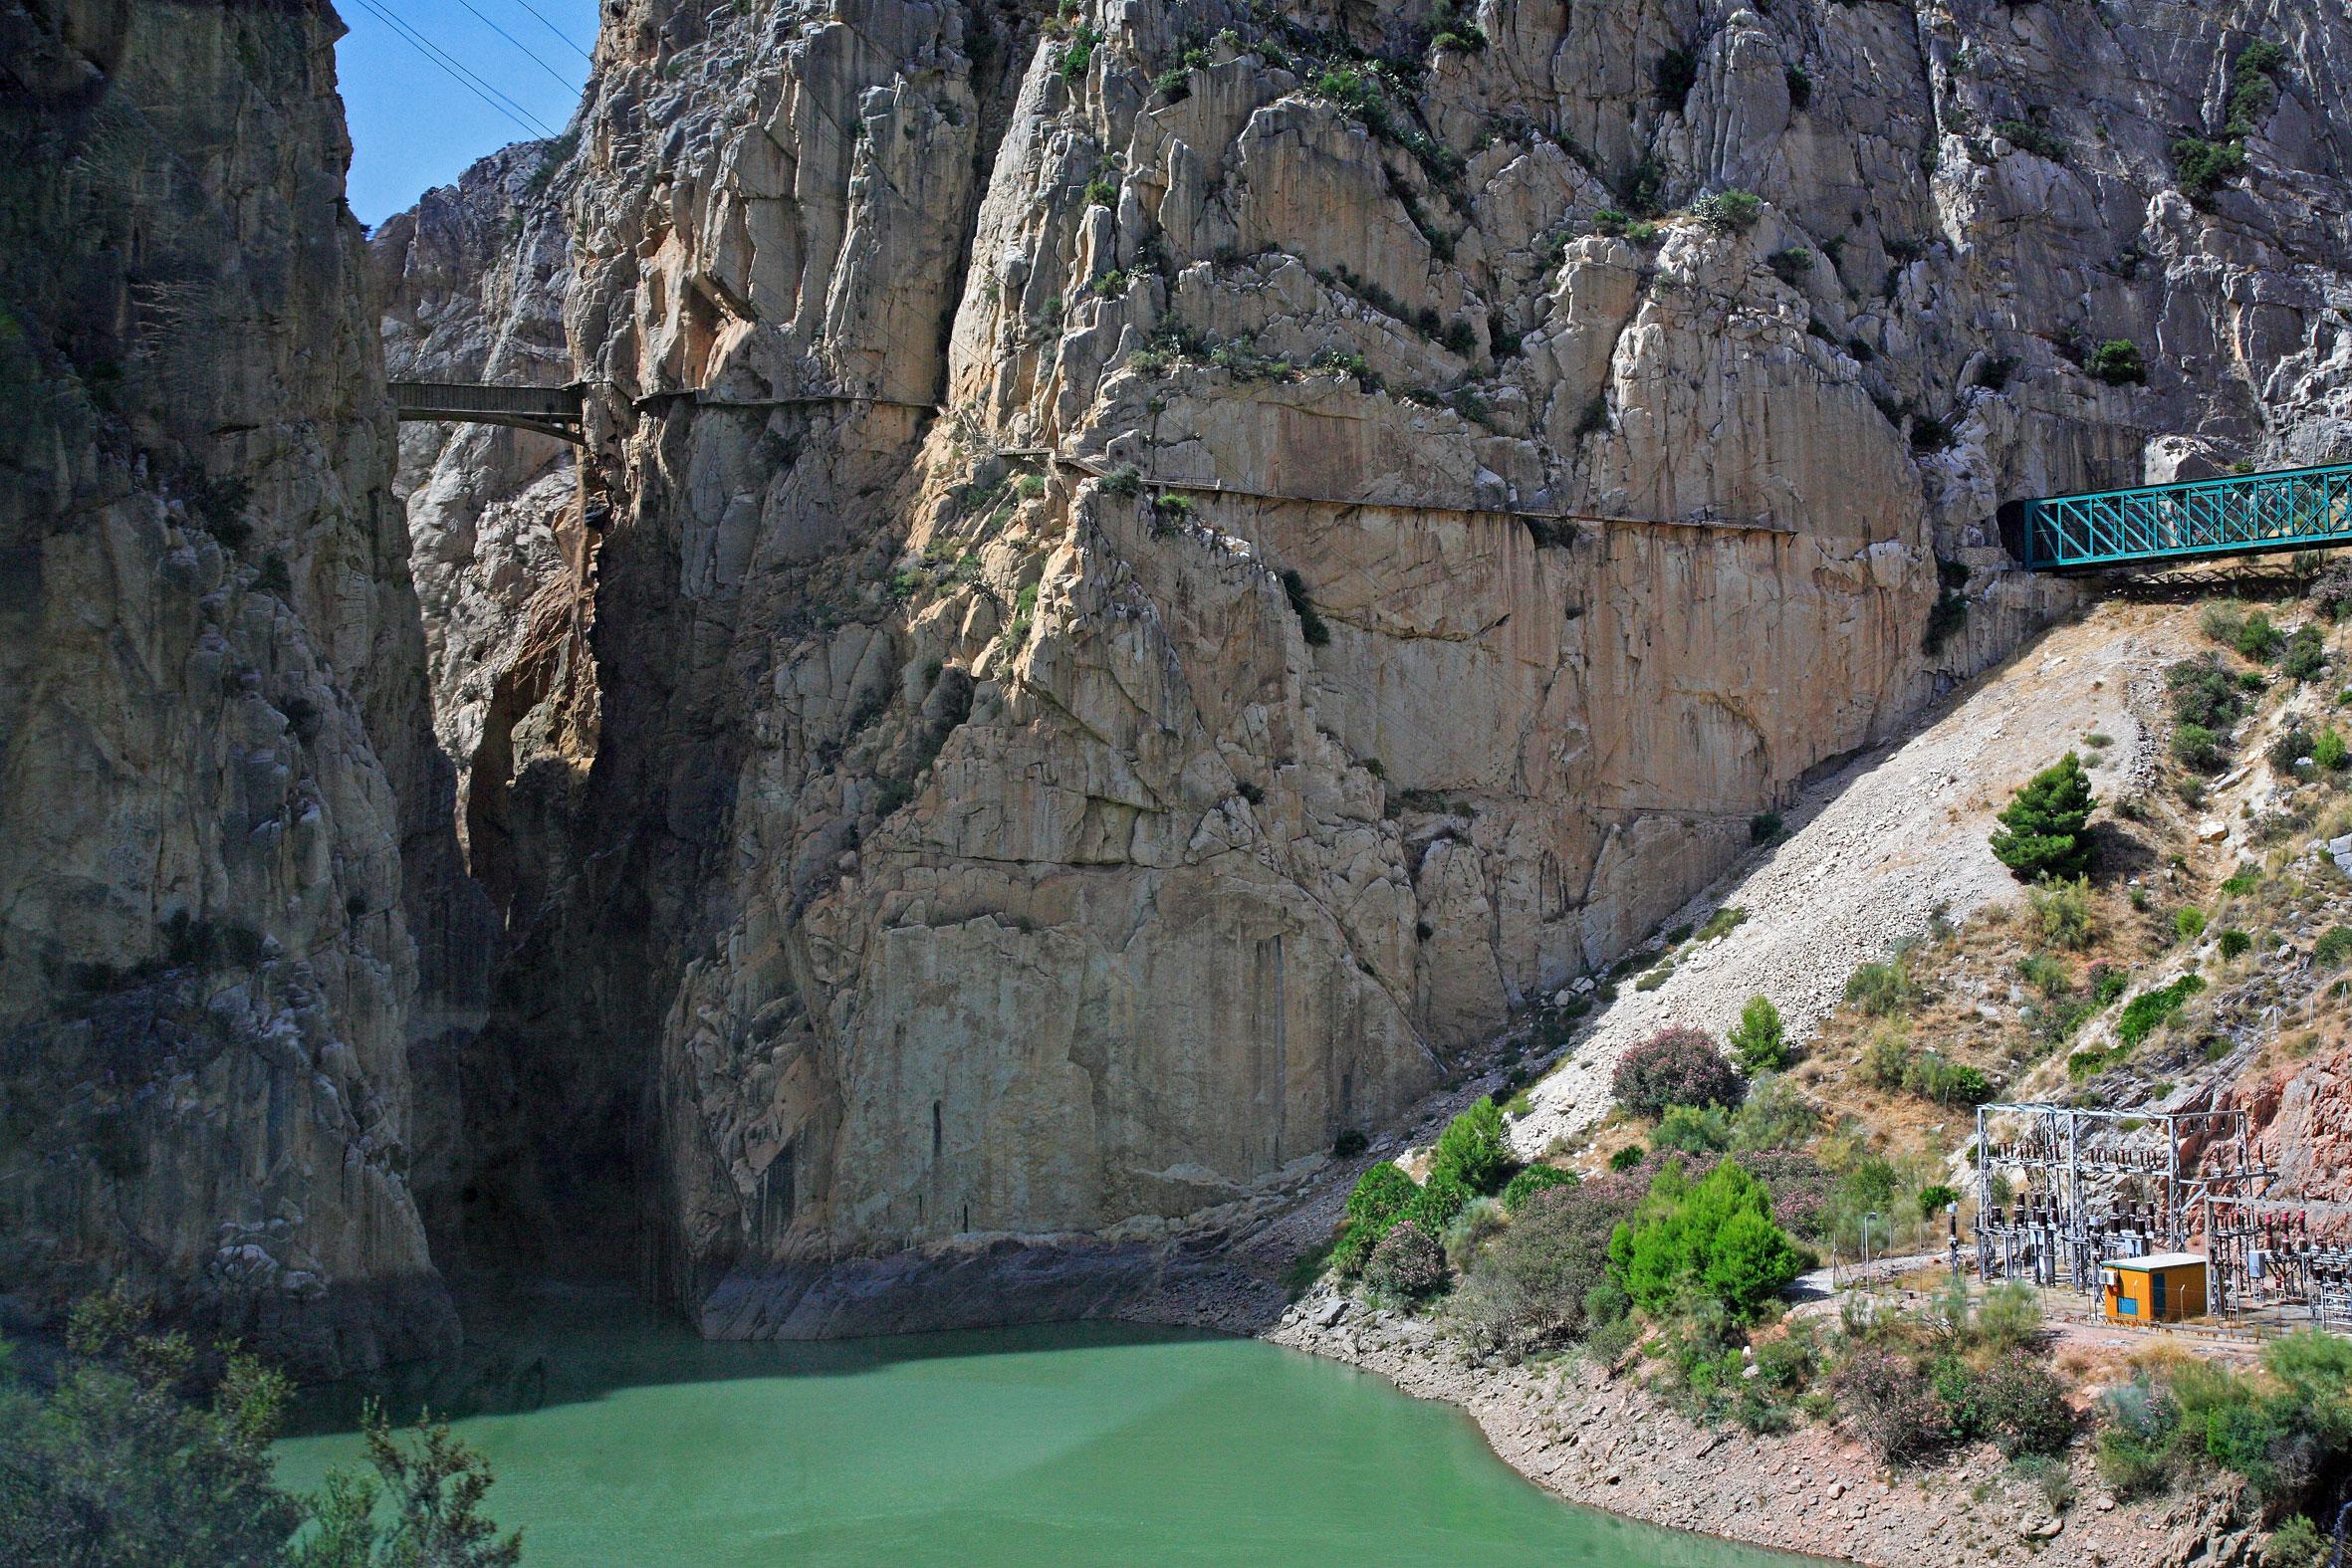 El Caminito del Rey. Un recorrido con historia [The king's narrow path, a journey into history]